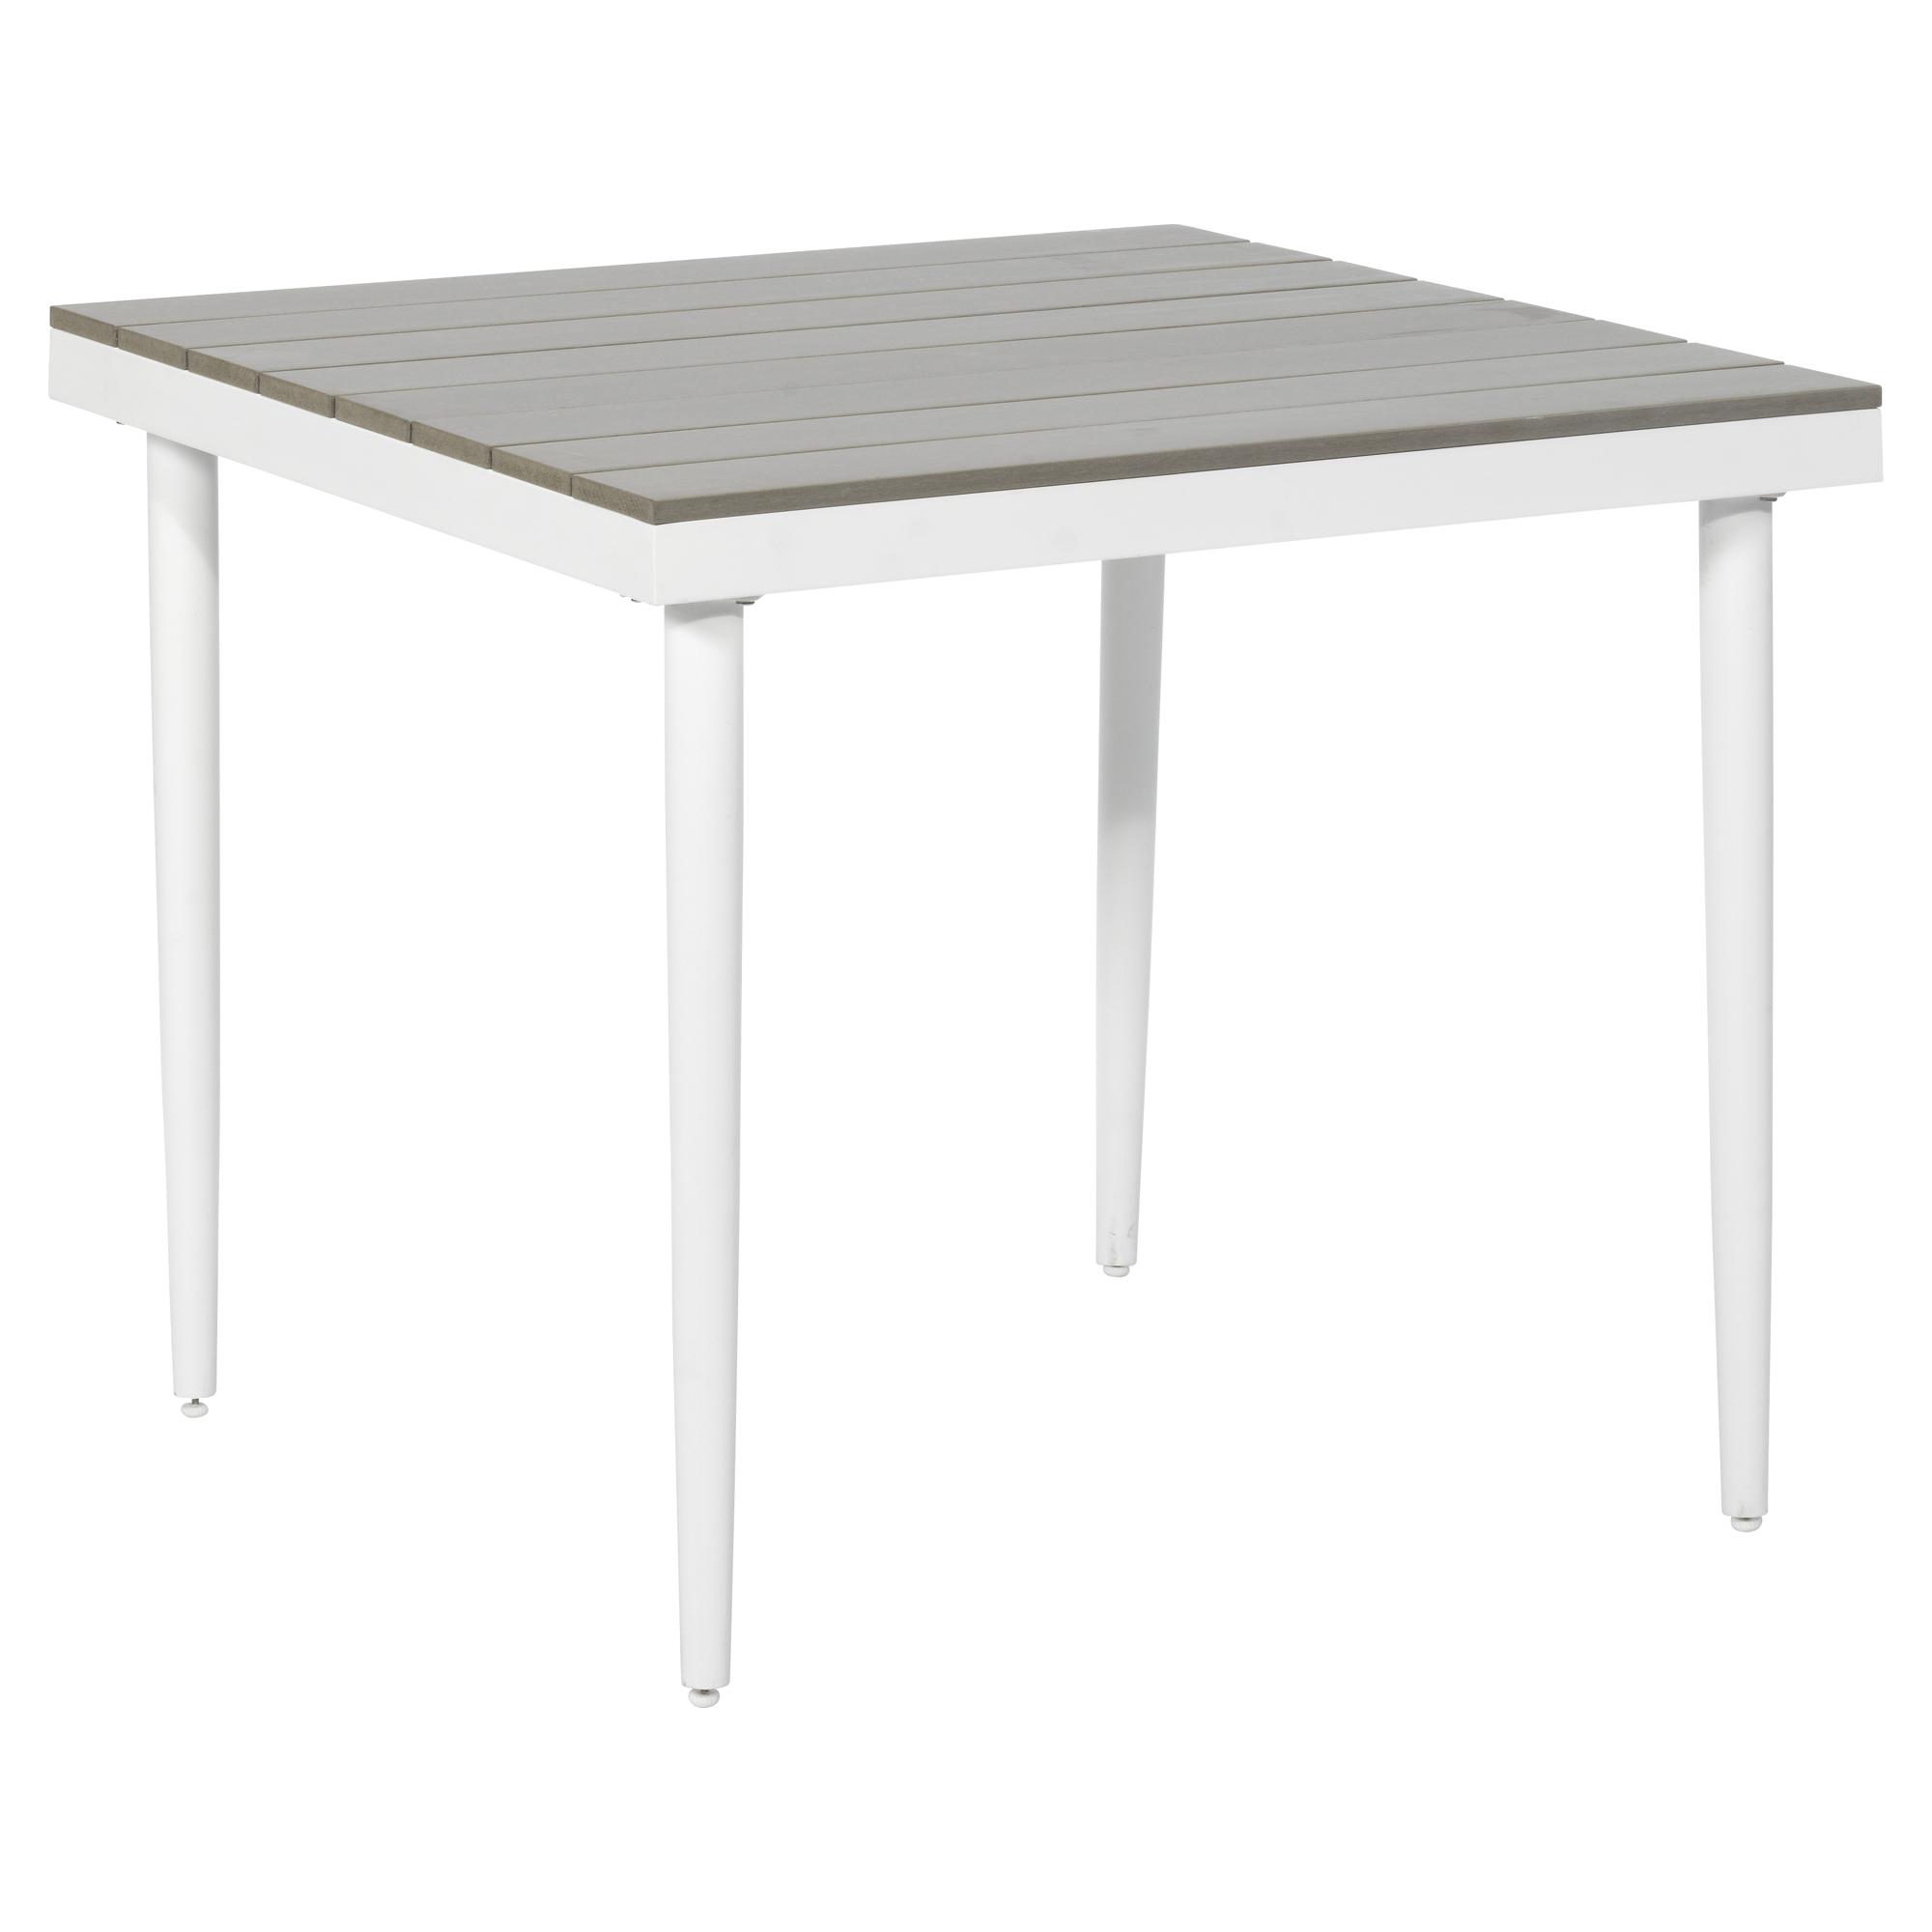 Gartentisch Moni Polywood Grau Weiss 90 X 90 X 76 Cm ǀ Toom Baumarkt